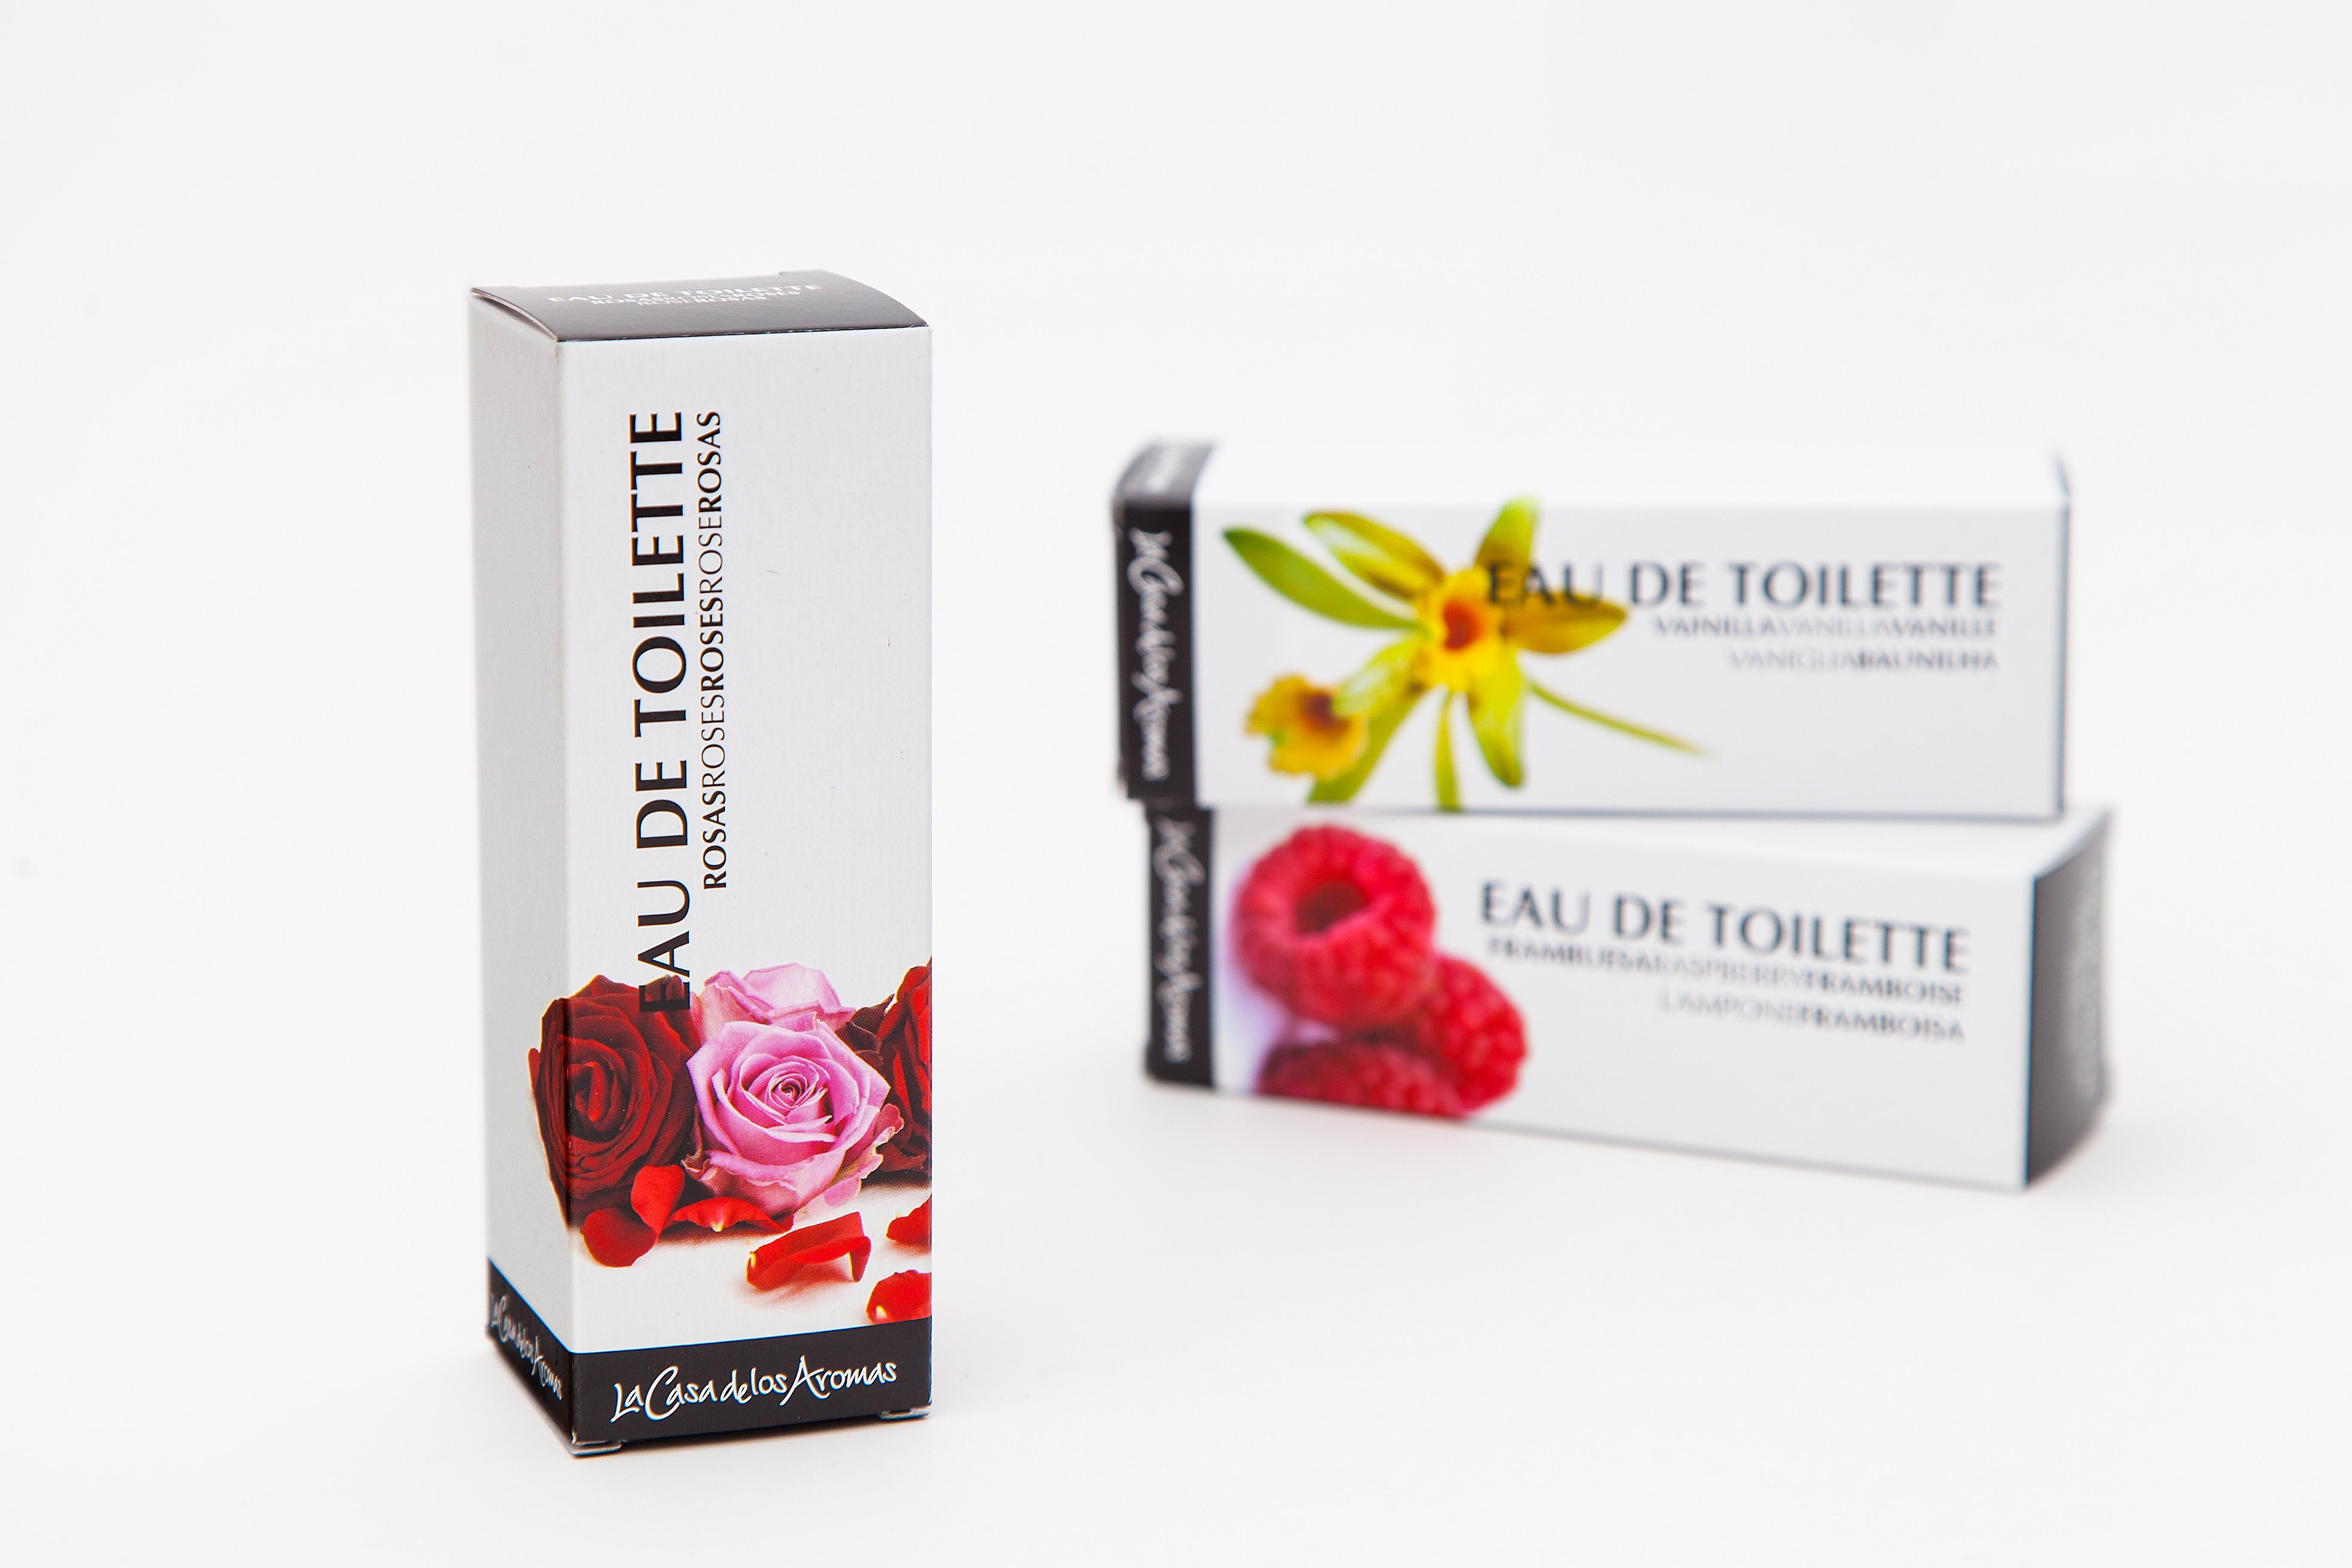 caja-casa-aromas-eau-de-toilette-copia